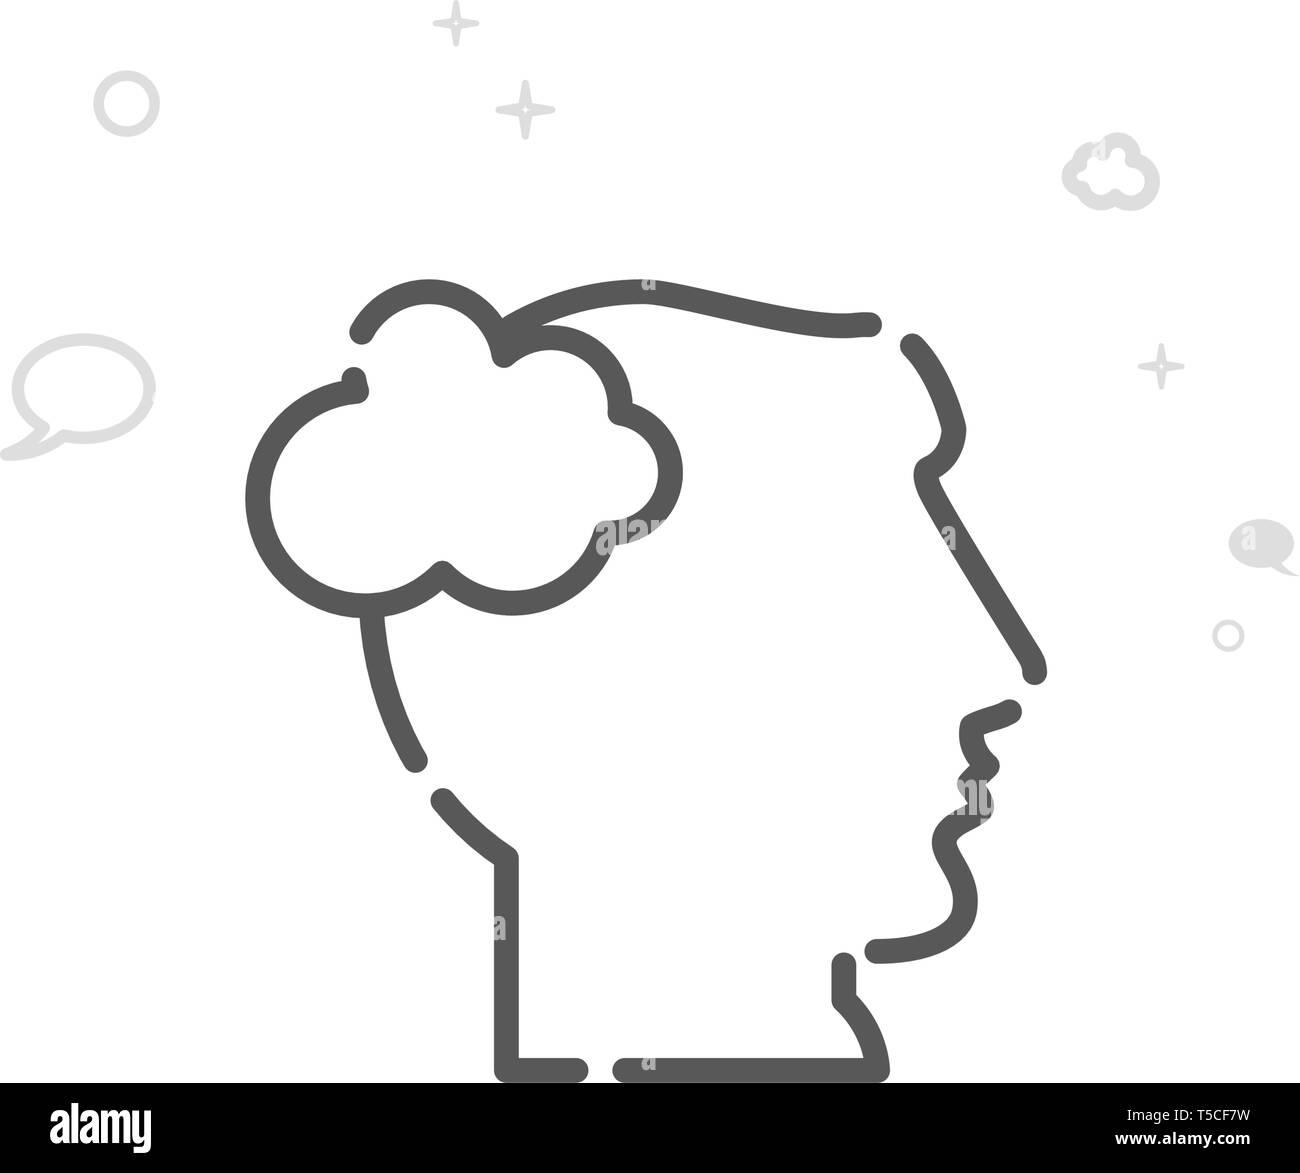 Cabeza humana, un hombre piensa Línea Vector Icono, Símbolo, Pictograma, signo. Luz de fondo geométrica abstracta. Trazo editable Imagen De Stock